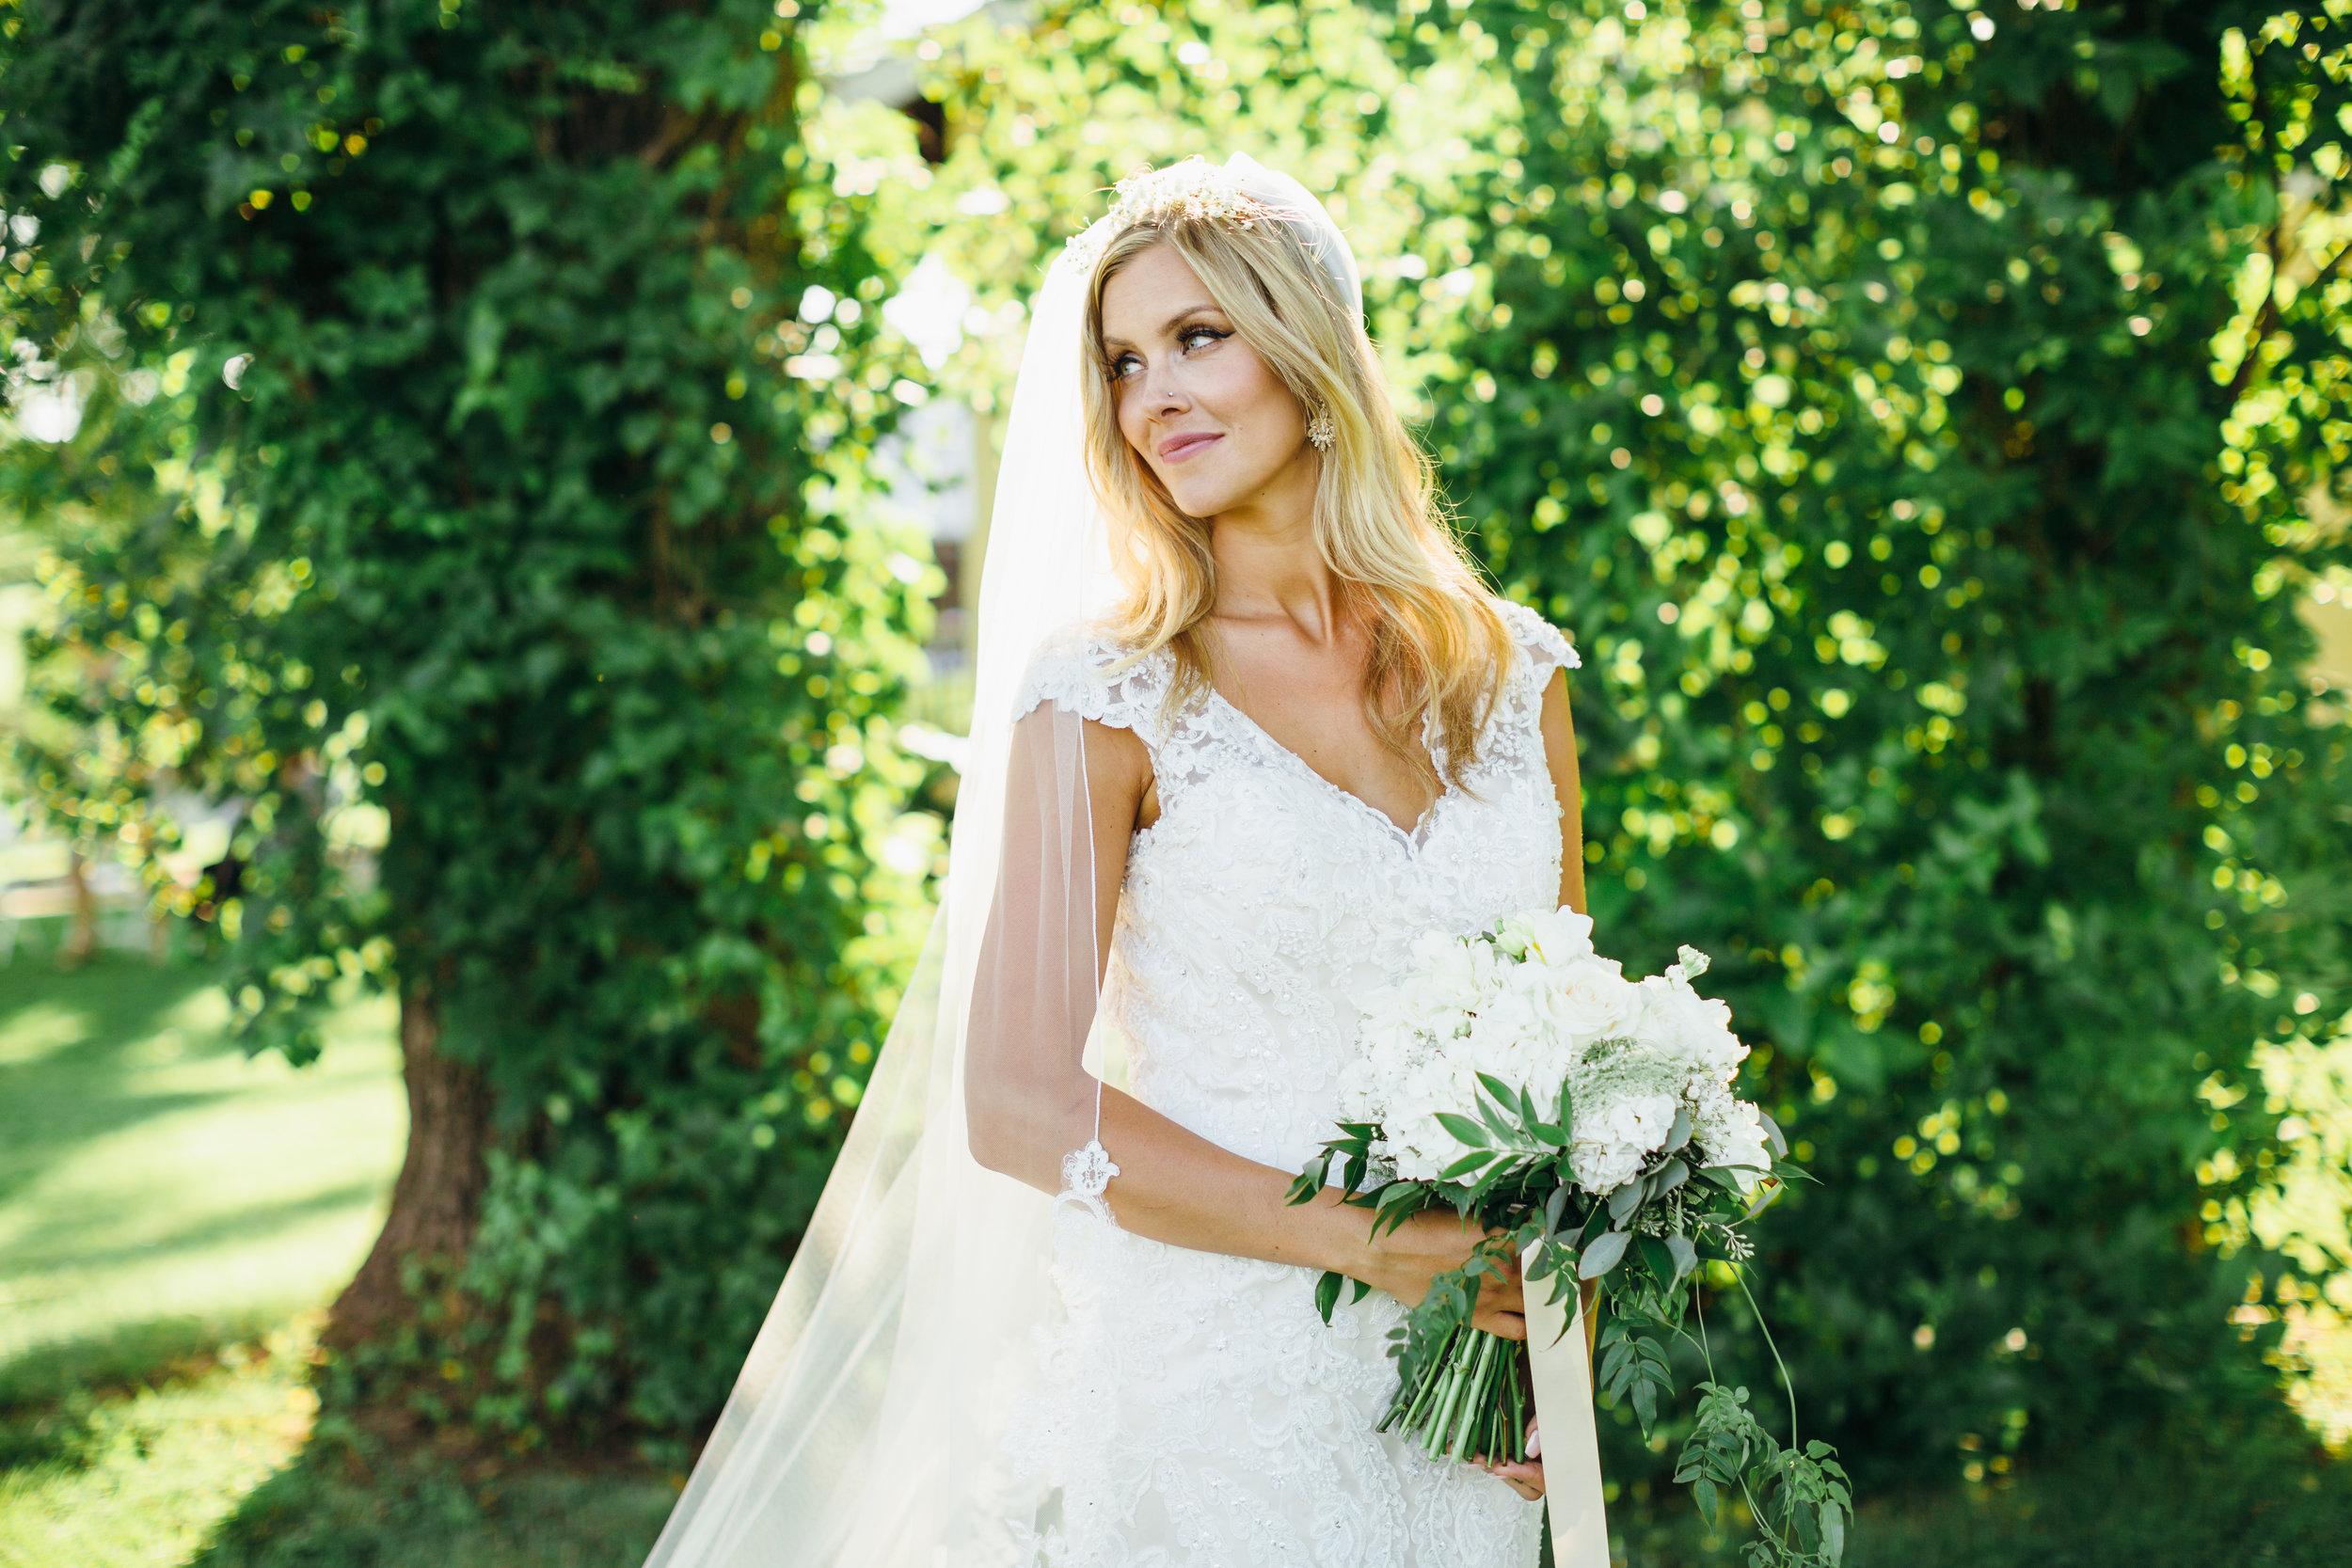 Lynchburg Wedding Photographer; Lynchburg Photographer; Lynchburg Wedding; Sorella Farms Wedding; Virginia Wedding Photographer; Virginia Wedding-19.jpg